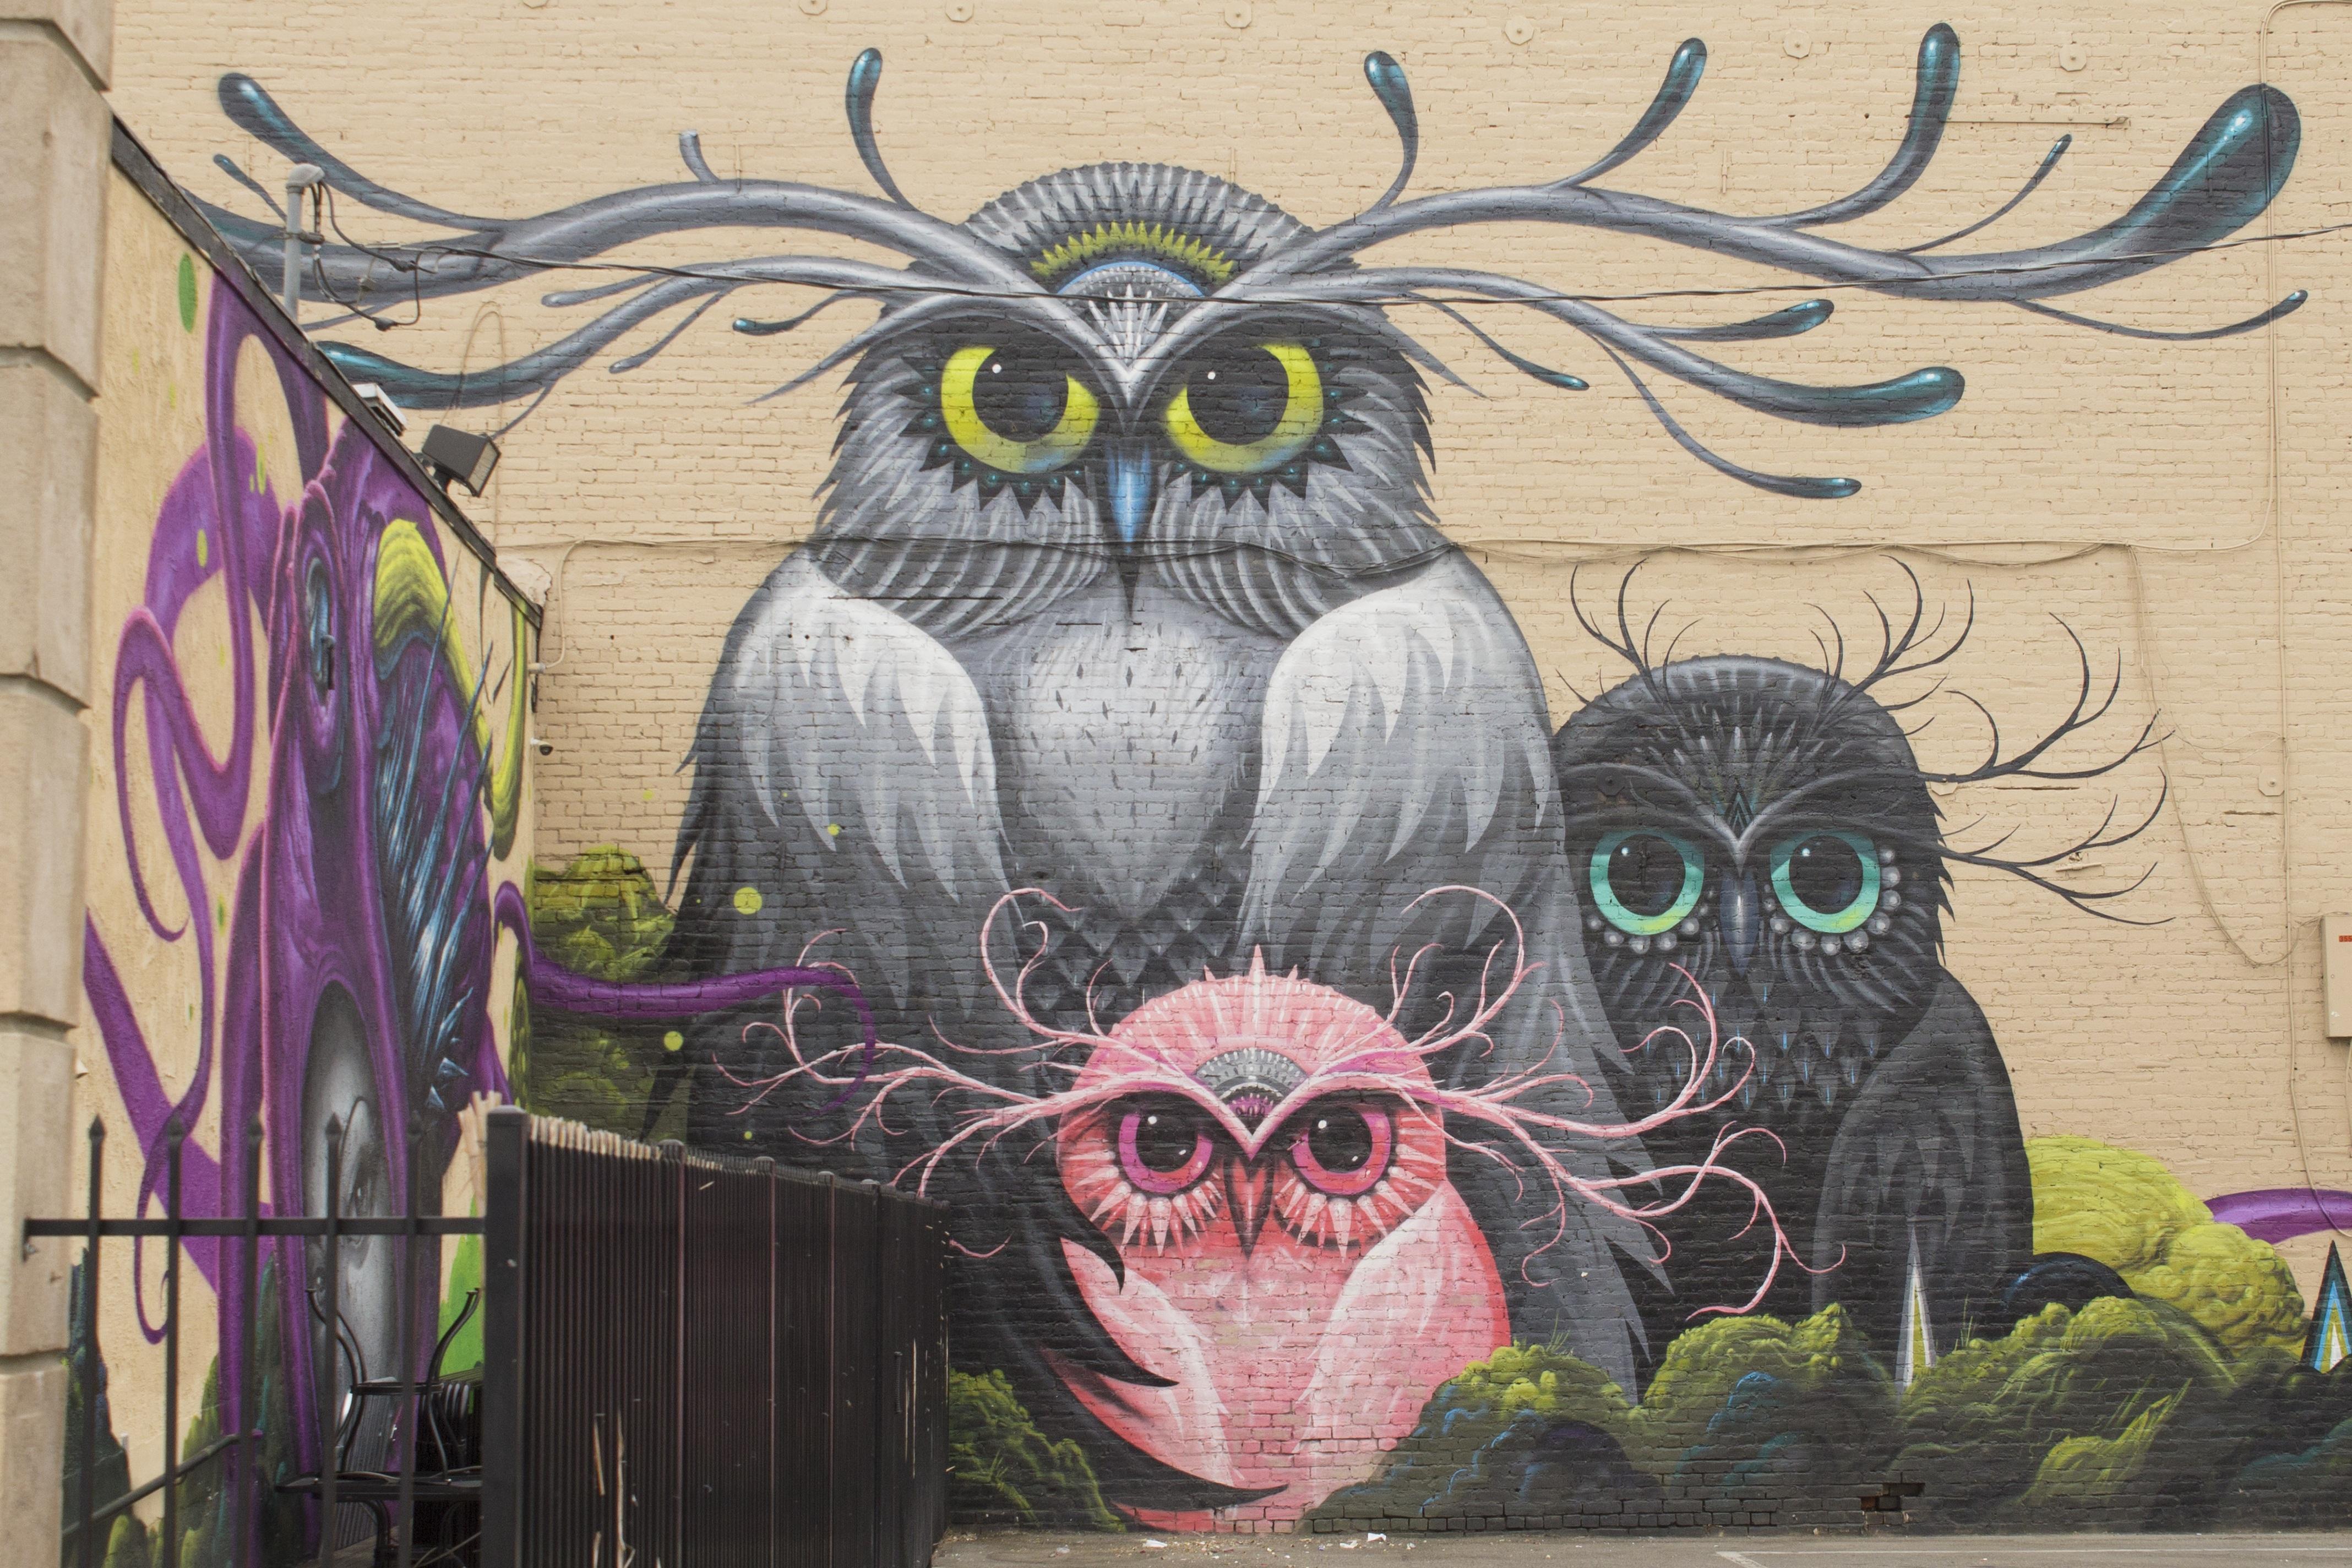 Gambar Perkotaan Artistik Coretan Burung Hantu Burung Buas